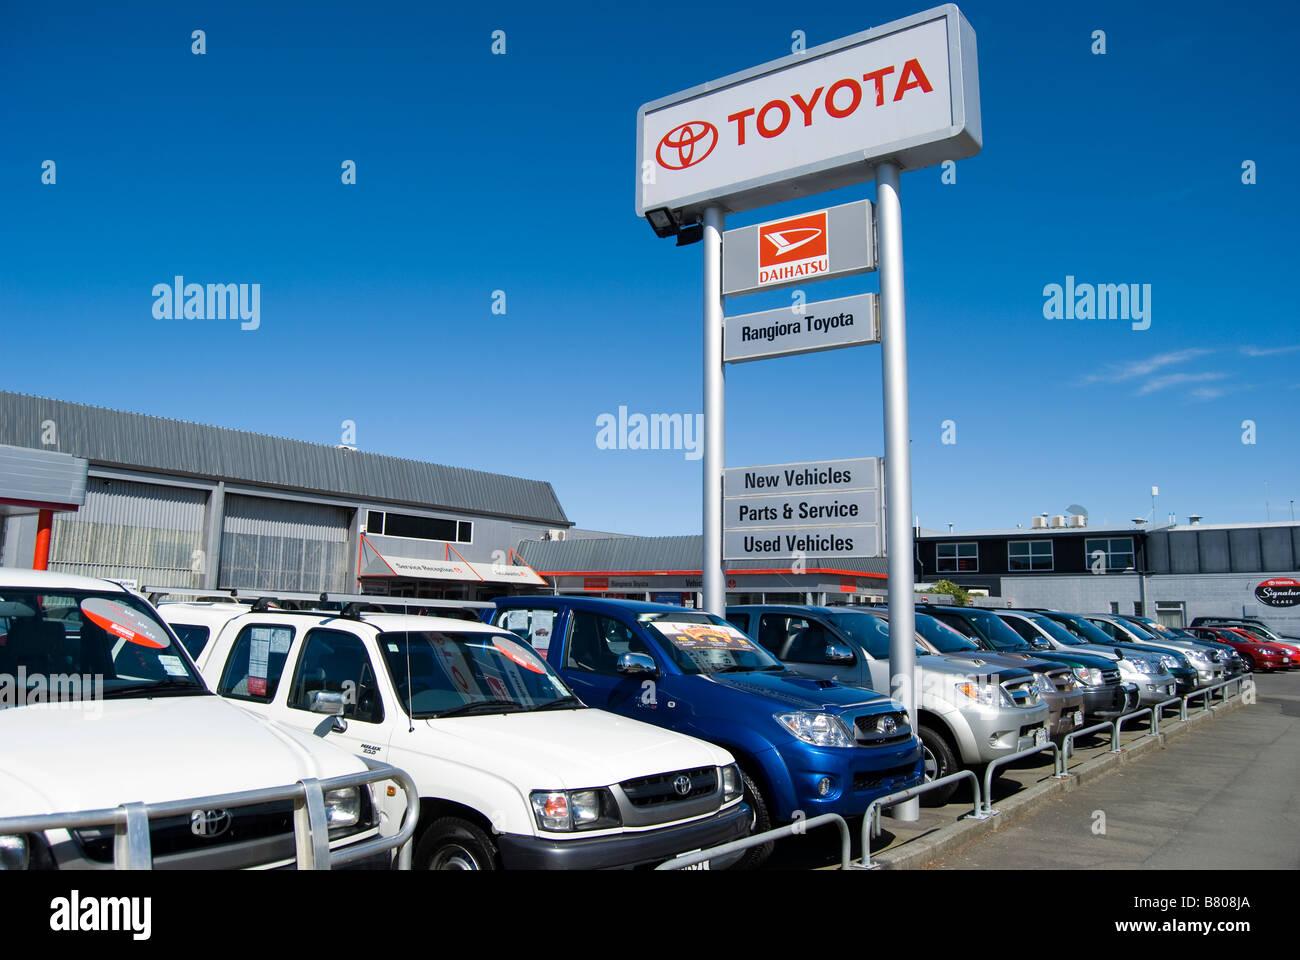 Rangiora Toyota Car Dealers, Percival Street, Rangiora, Waimakariri District, Canterbury, New Zealand - Stock Image